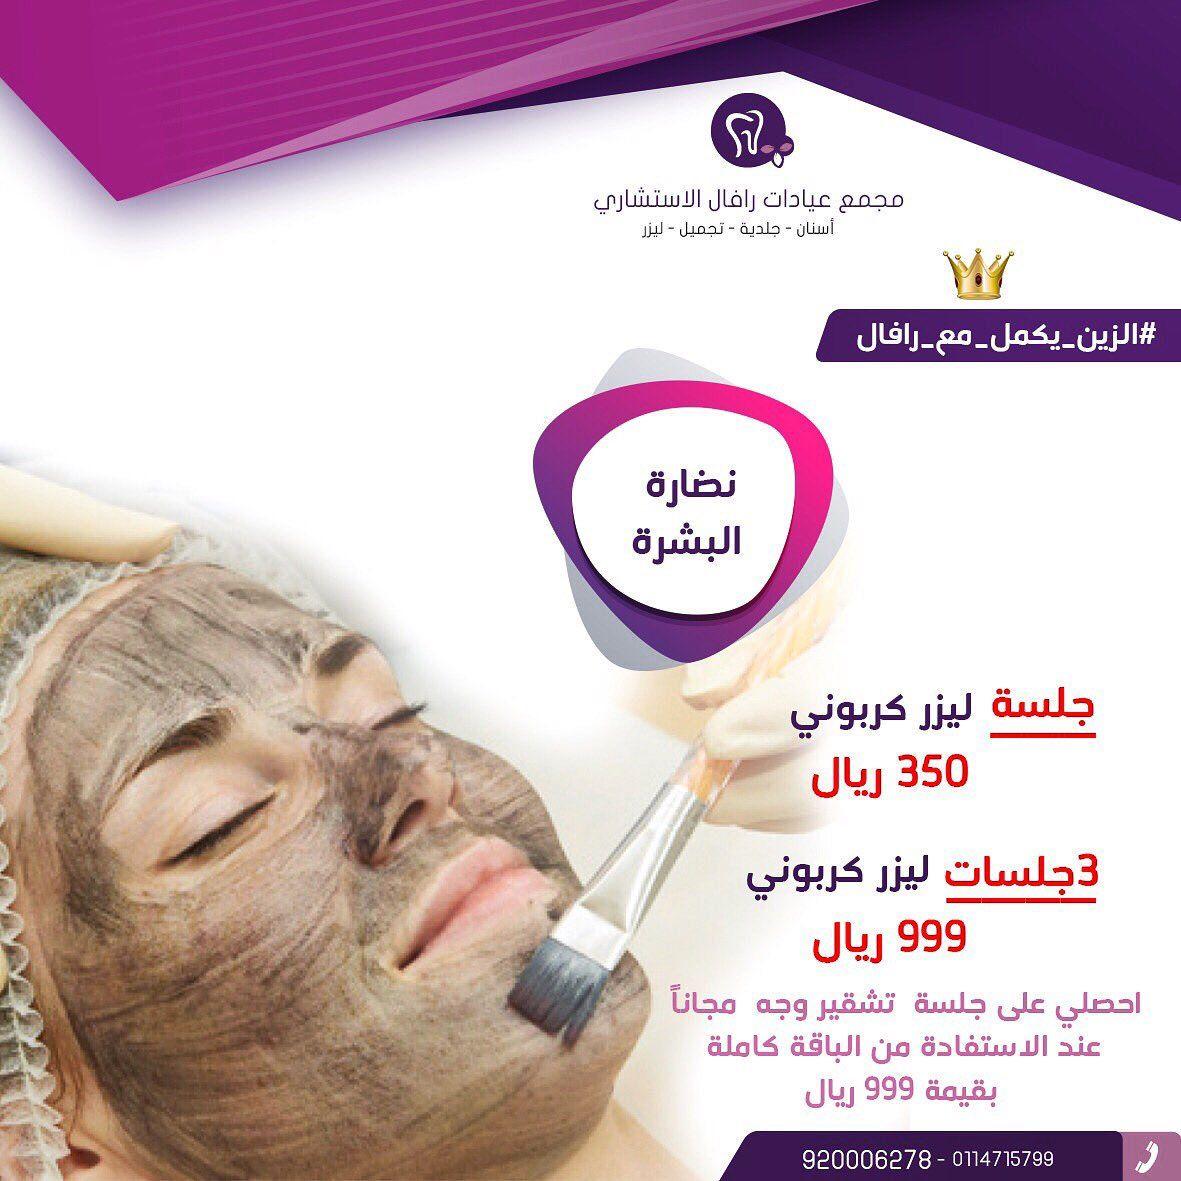 ماسك كربوني Beauty Center Beauty Sleep Eye Mask